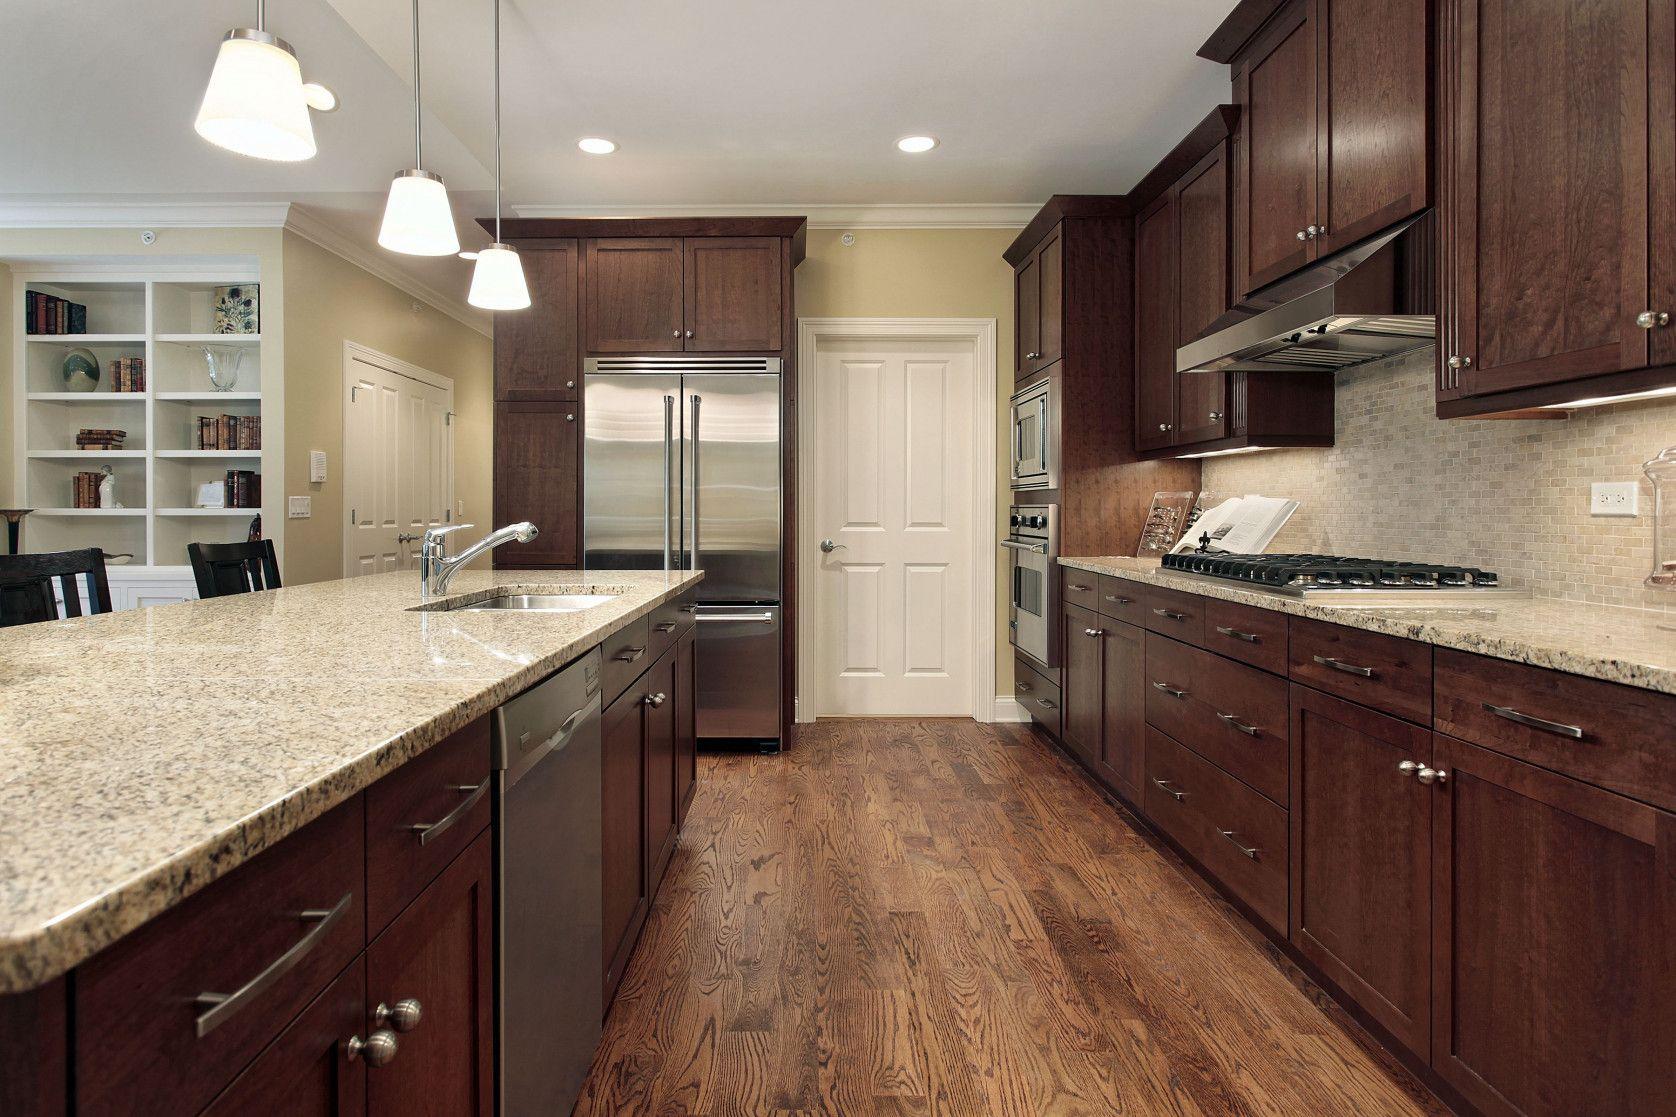 2019 walnut kitchen cabinets granite countertops kitchen cabinets countertops ideas check more on kitchen ideas with dark cabinets id=12259